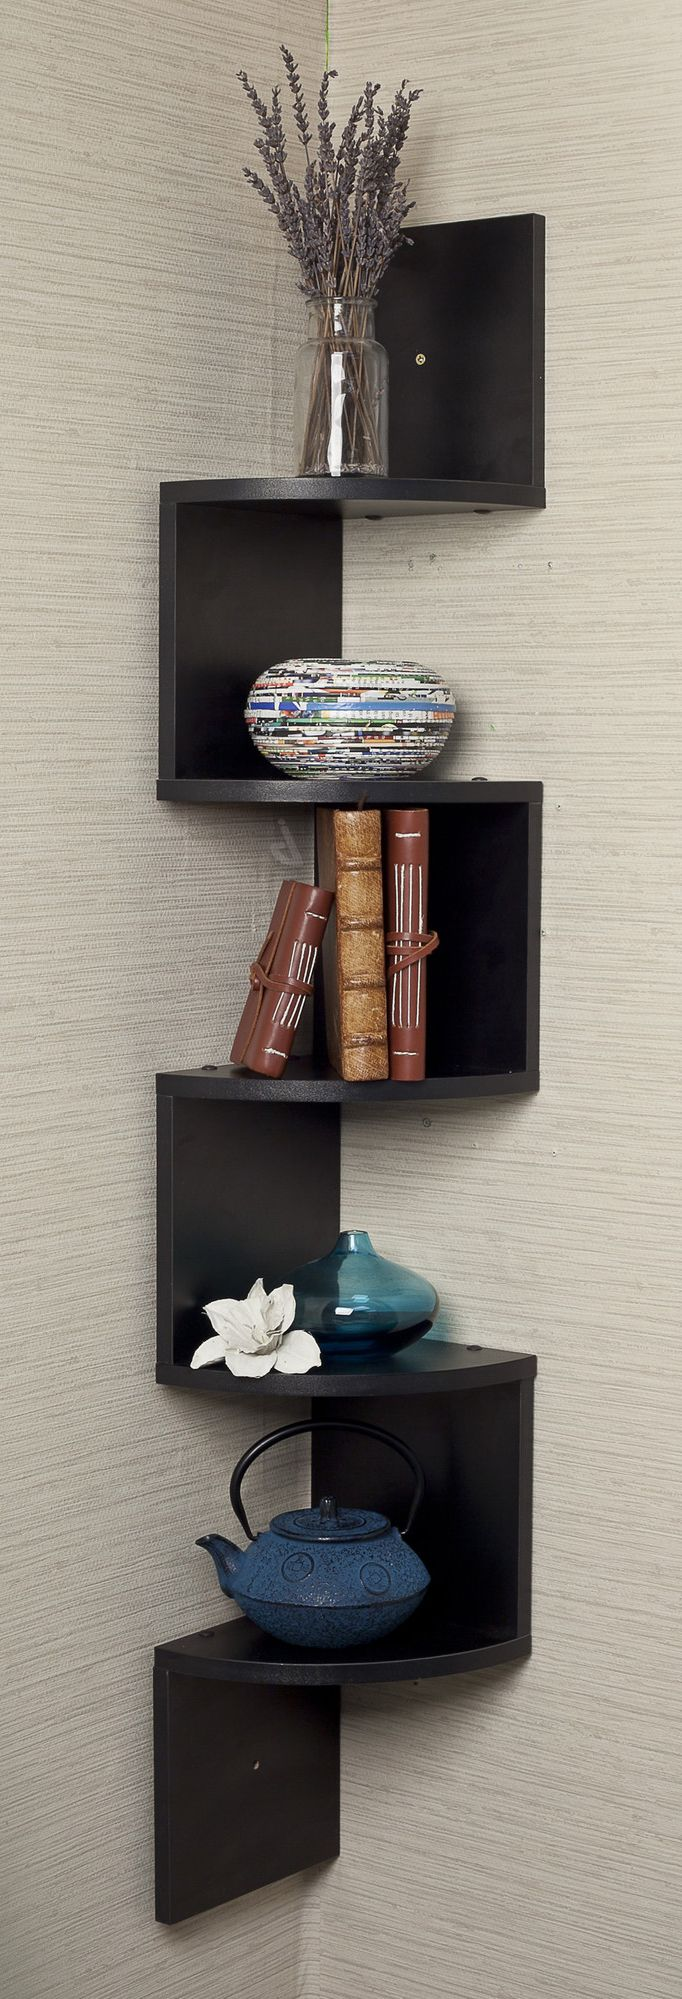 Zig Zag Corner Wall Shelf Clever Design